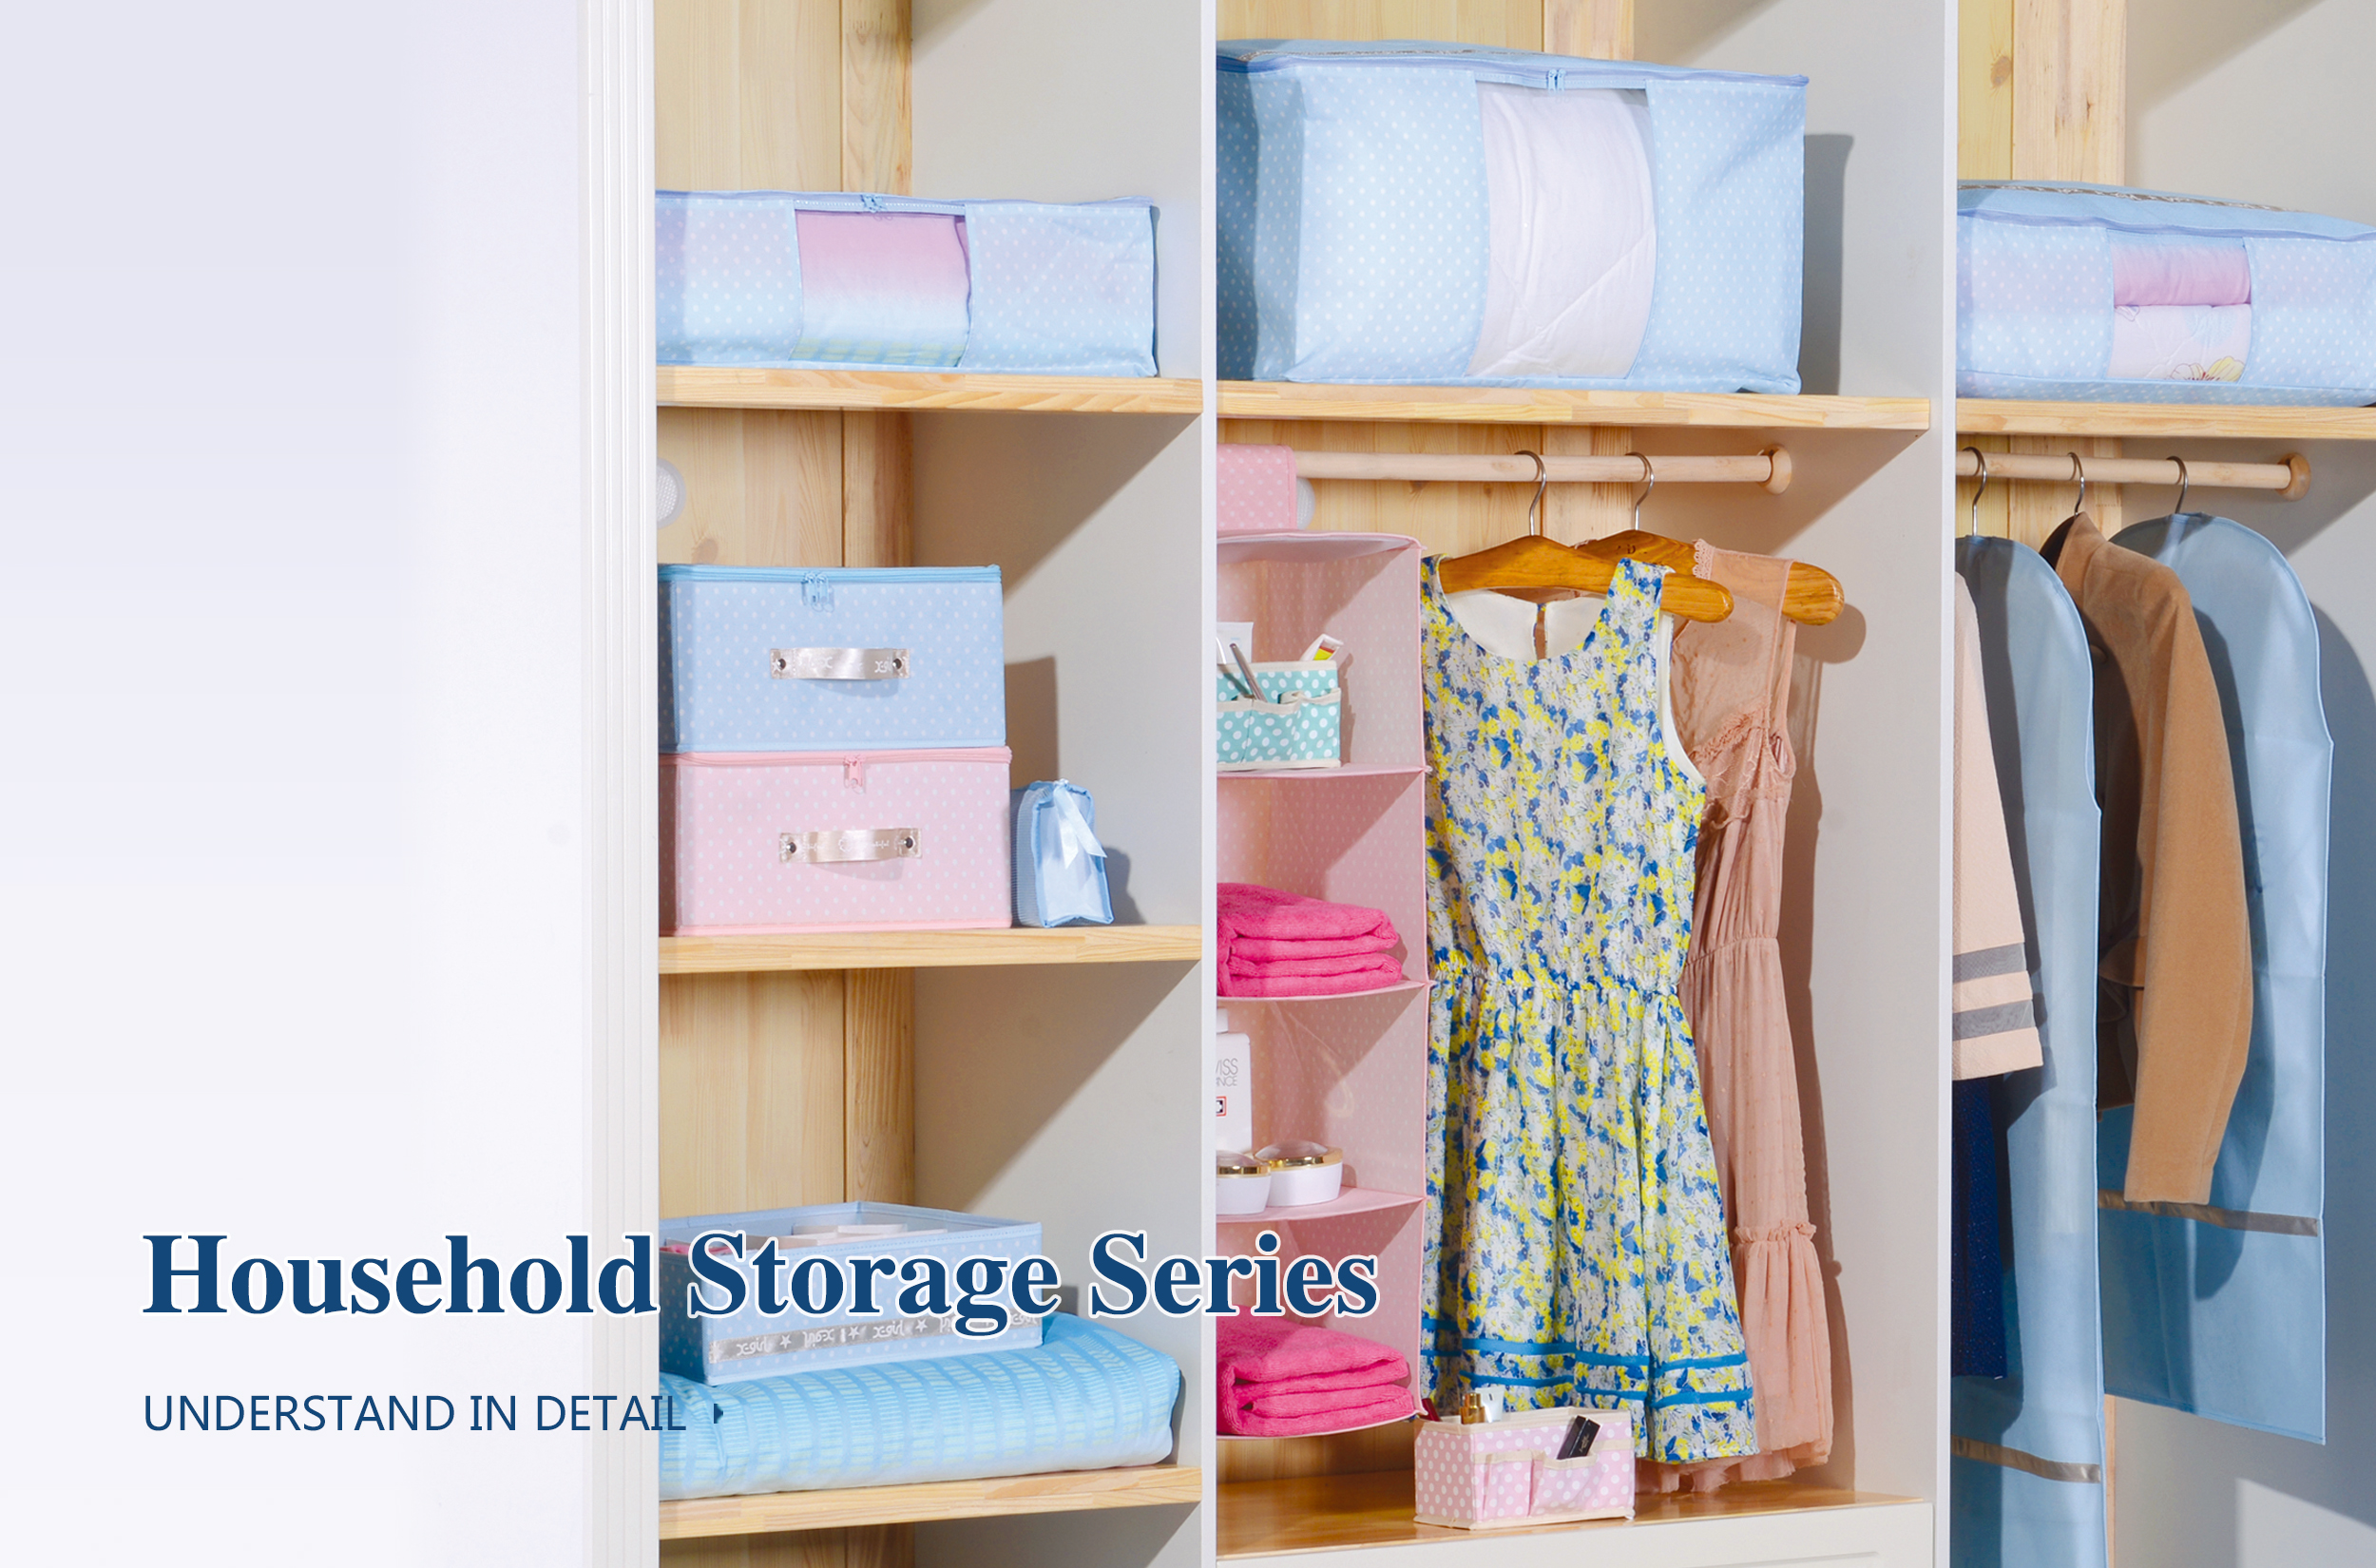 HOUSEHOLD STORAGE SERIES